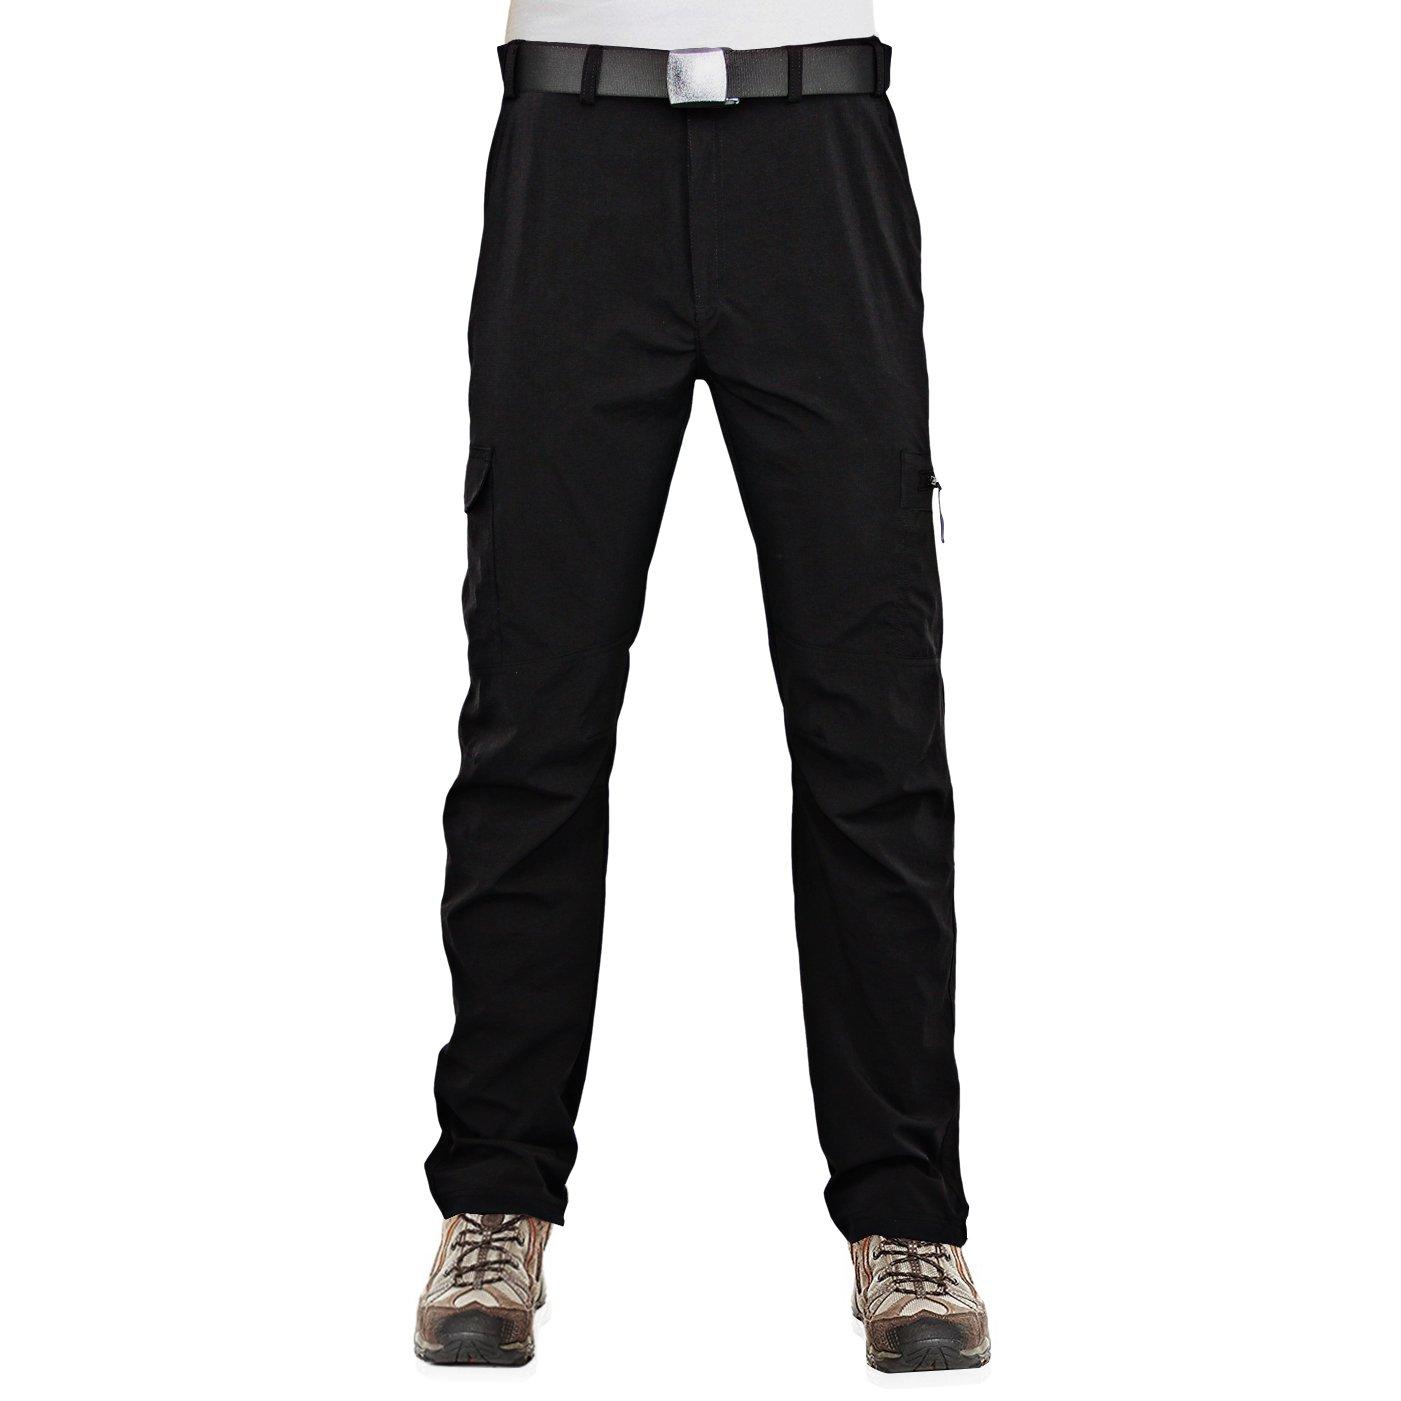 Black 38W x 32L InfinityDry Men's Quick Dry Outdoor Pants Hiking Camping